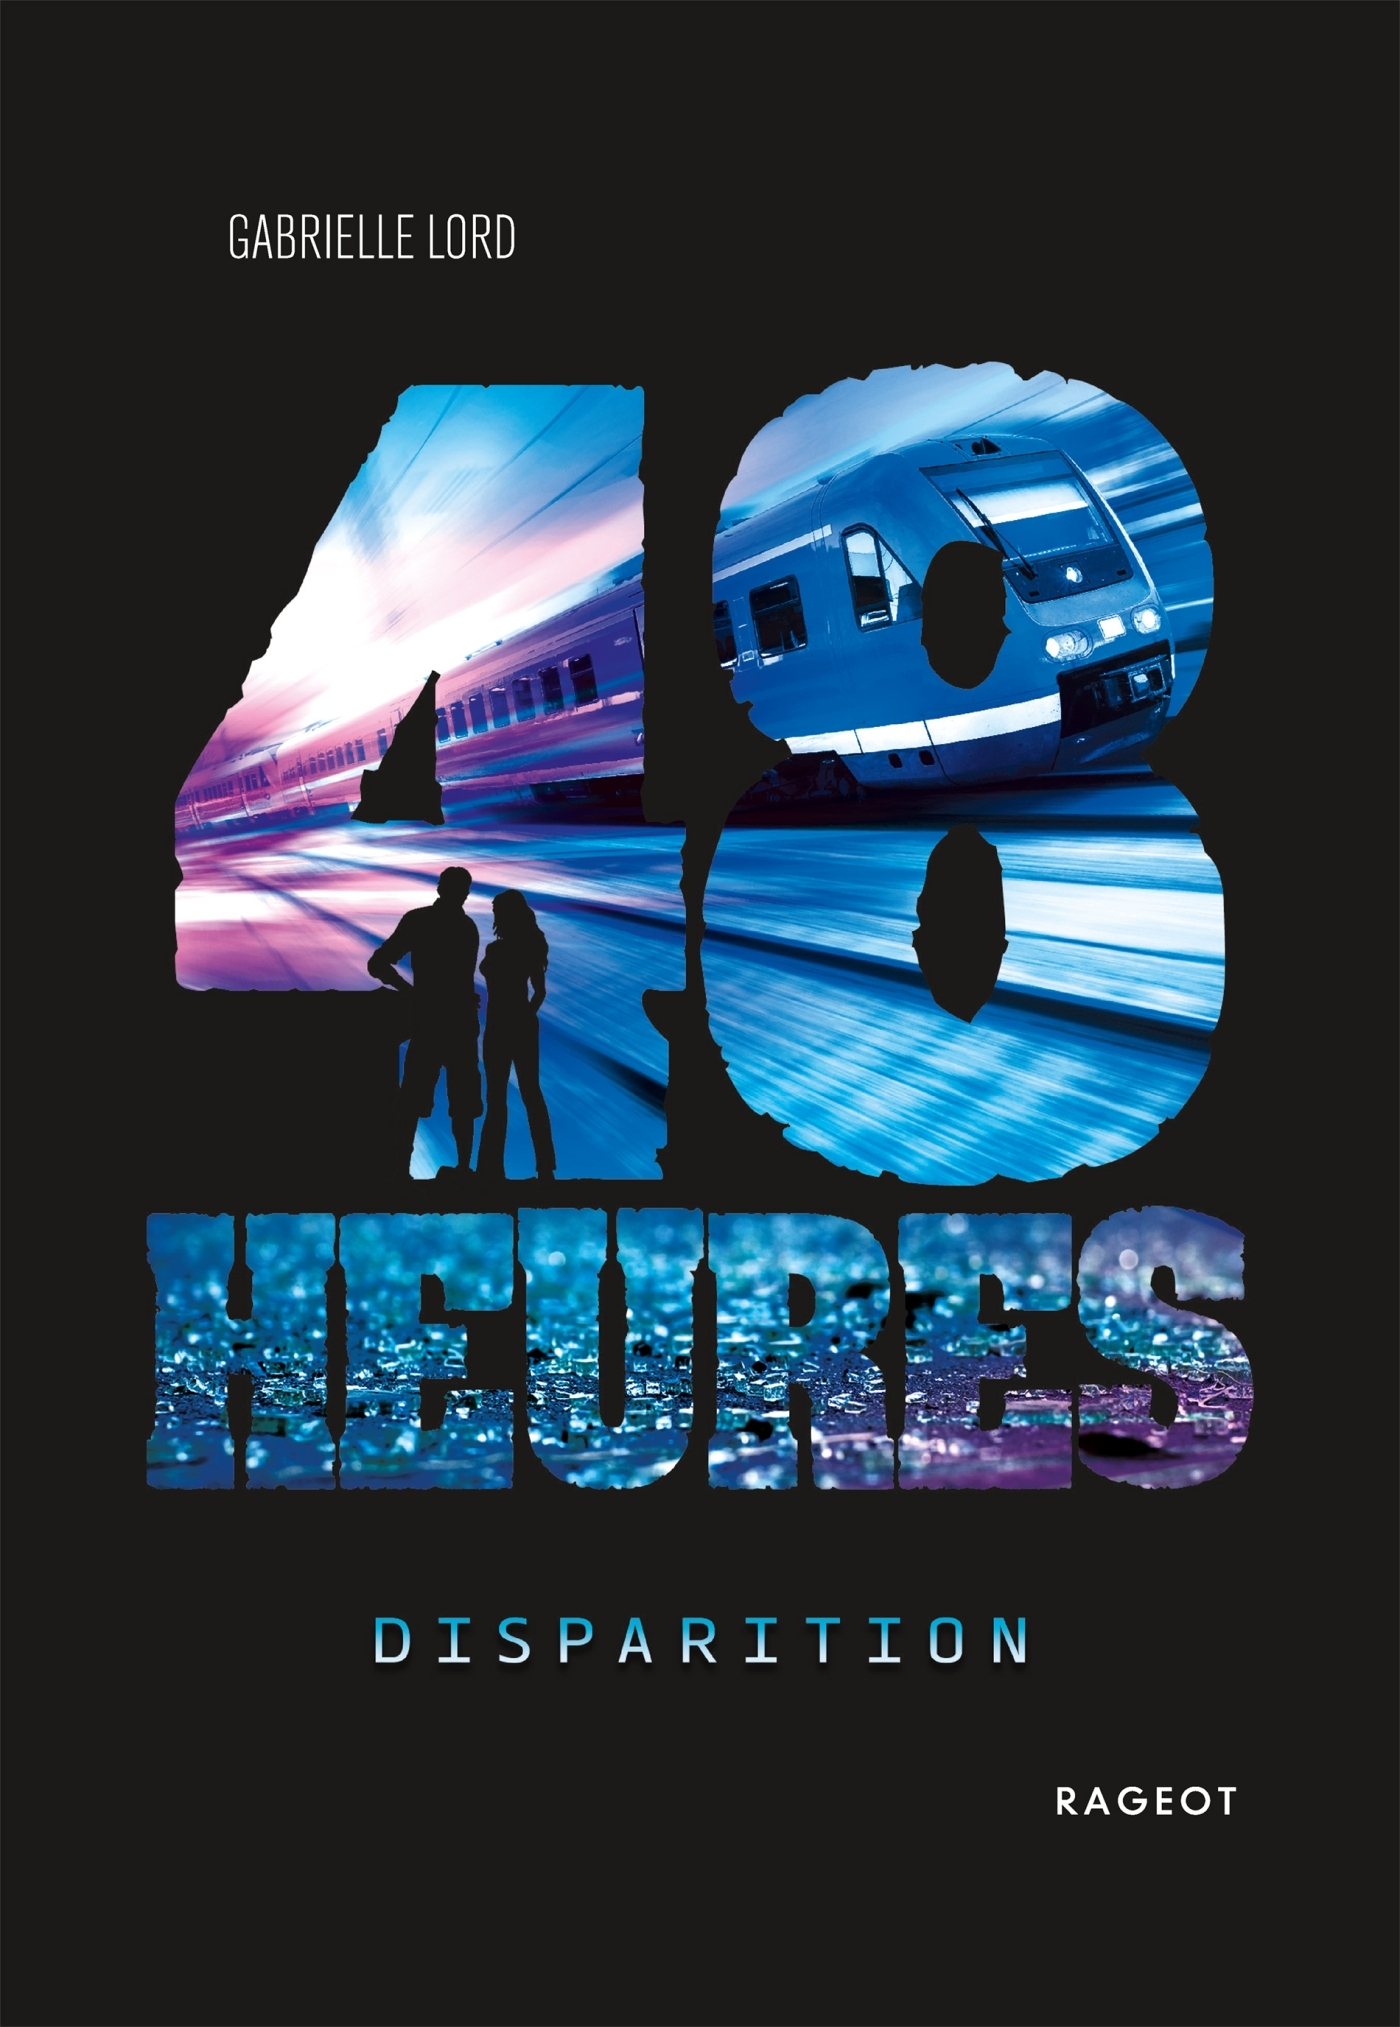 48 HEURES - DISPARITION